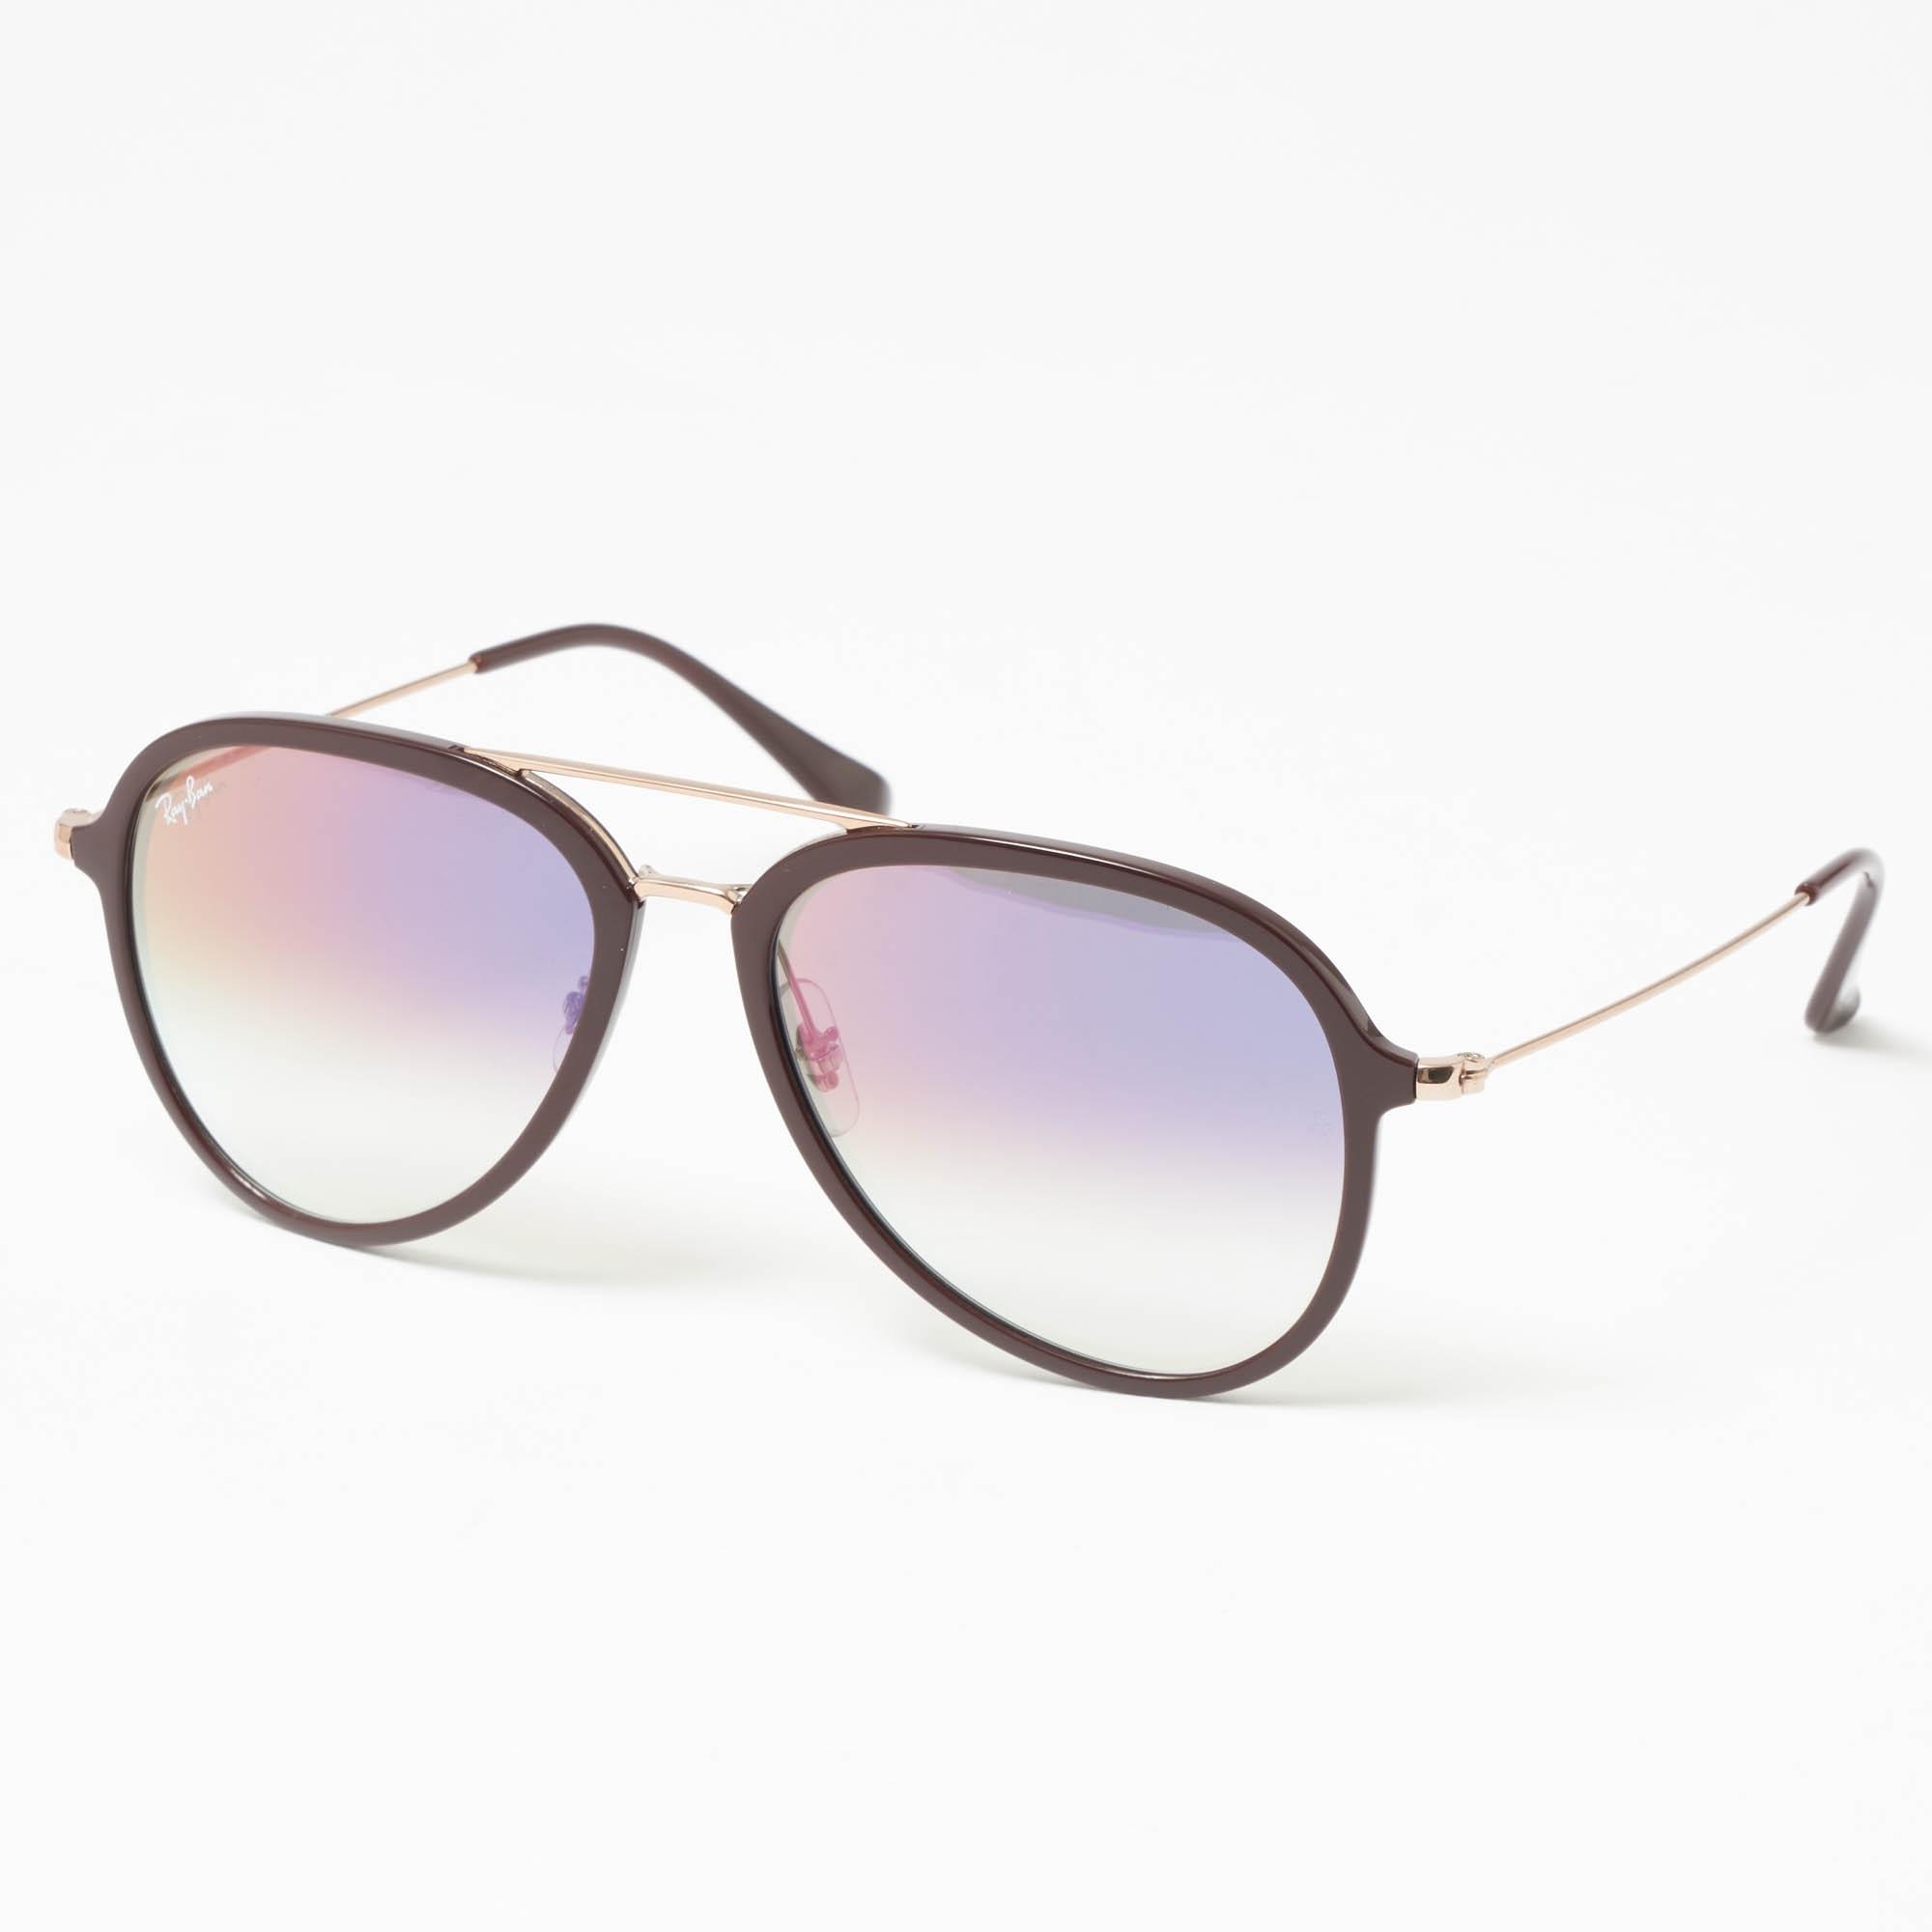 2ed31b4ebf6 Ray Ban Plum RB4298 Sunglasses Gradient Lenses